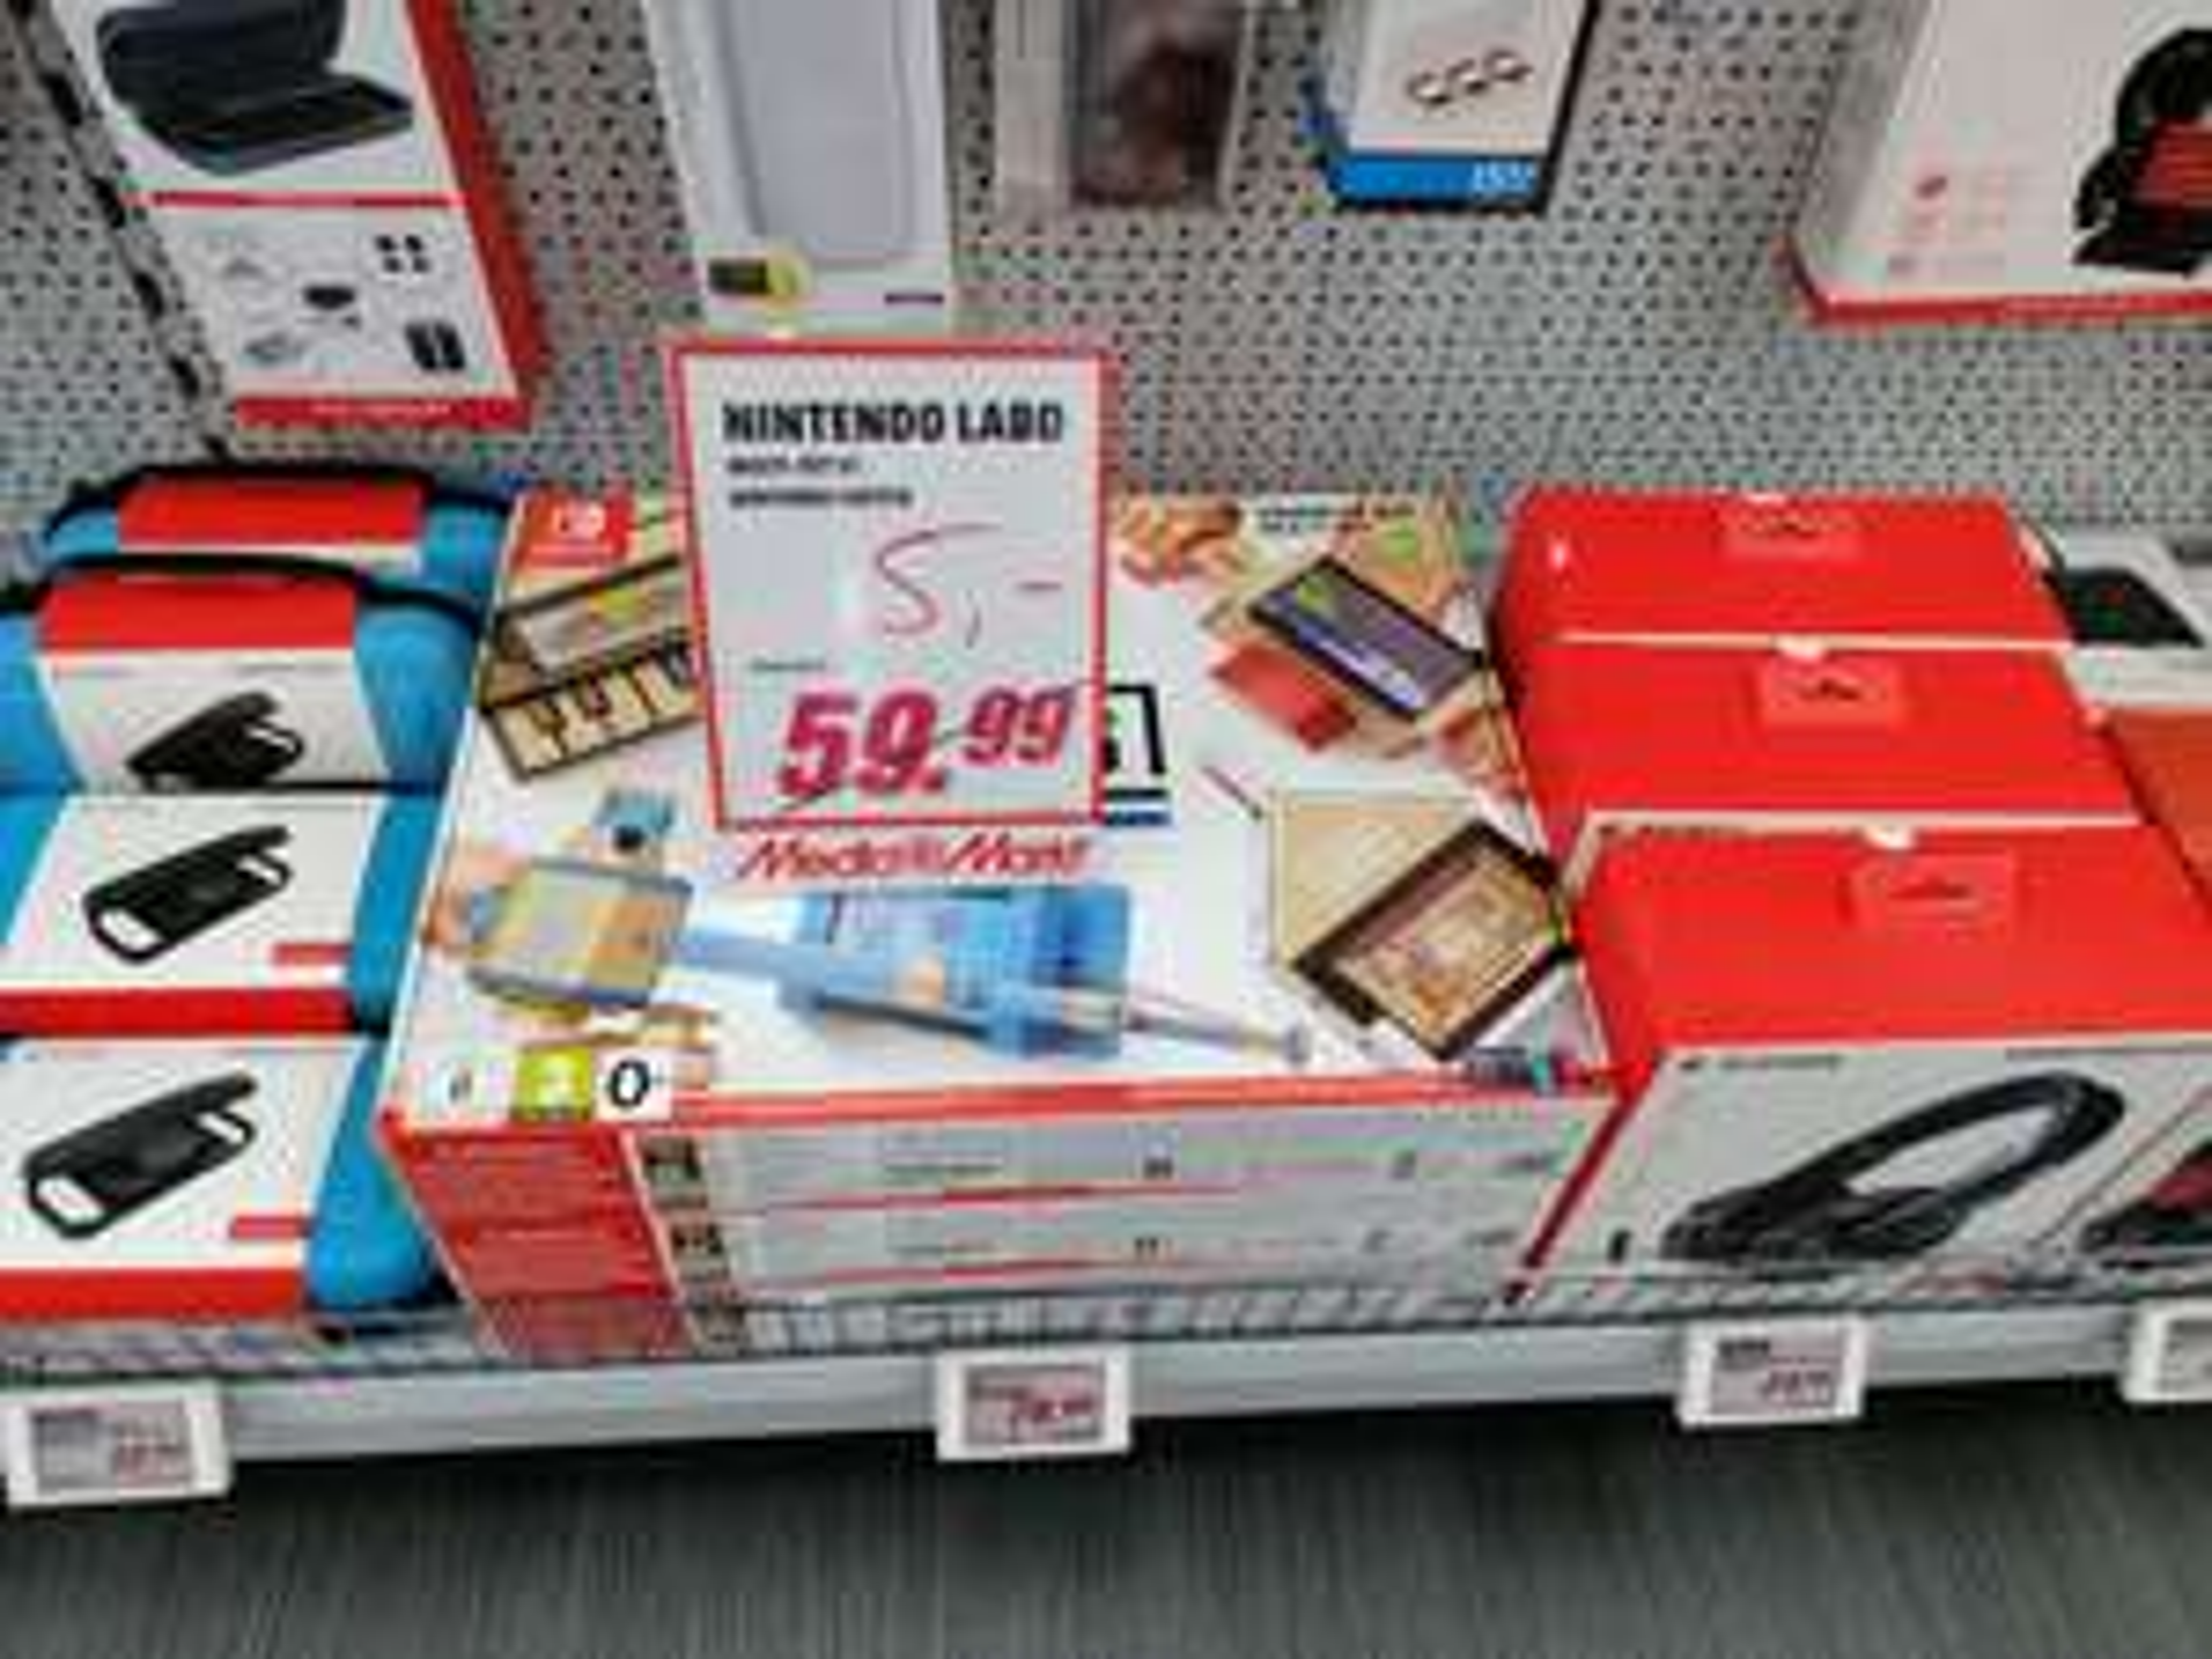 Nintendo Labo Toy-Con 01 Multi-Kit (Lokal Media Markt Peine)